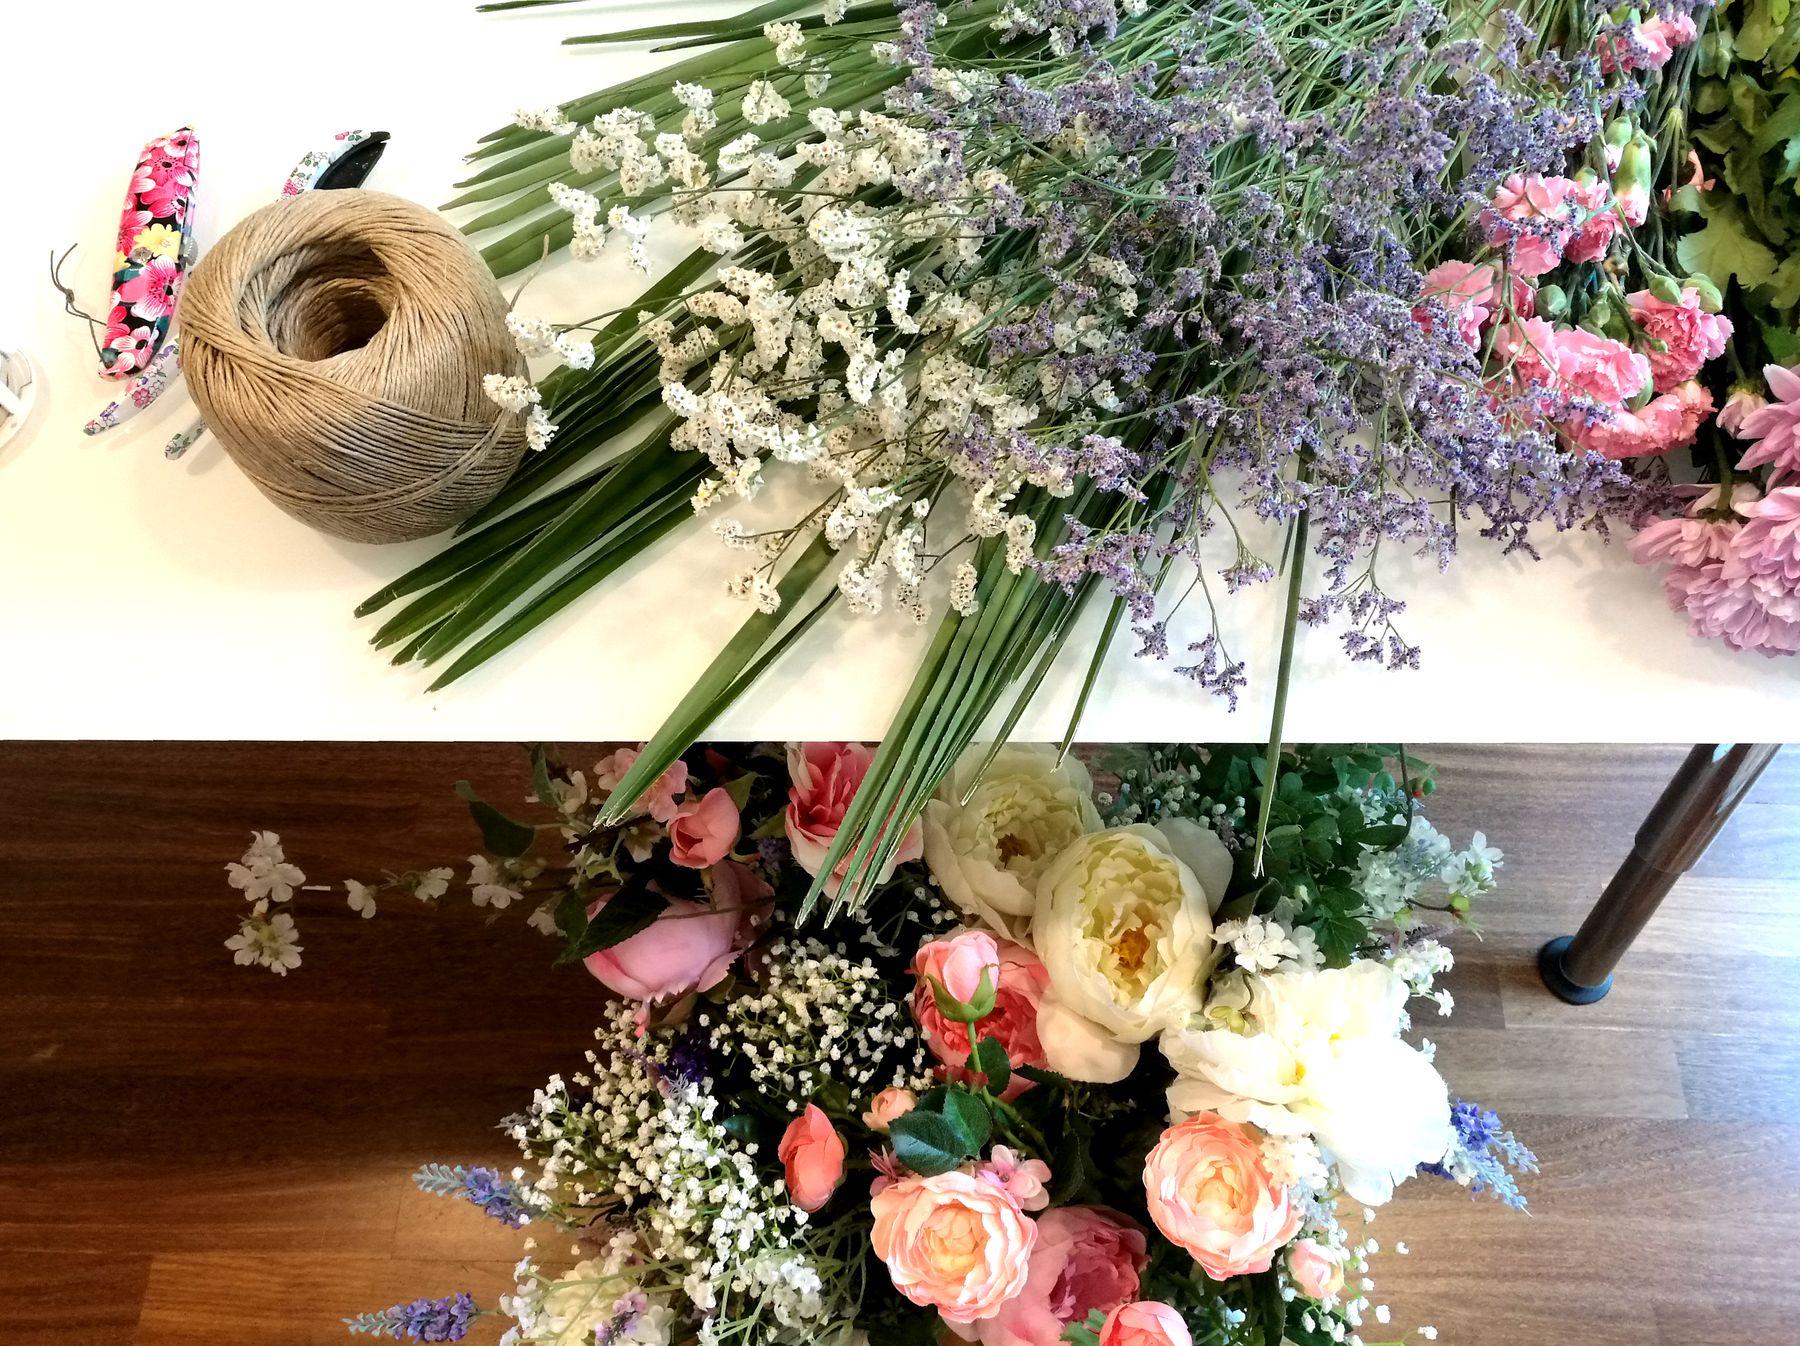 Blossom zine decorazione floreale per Home Philosophy Academy